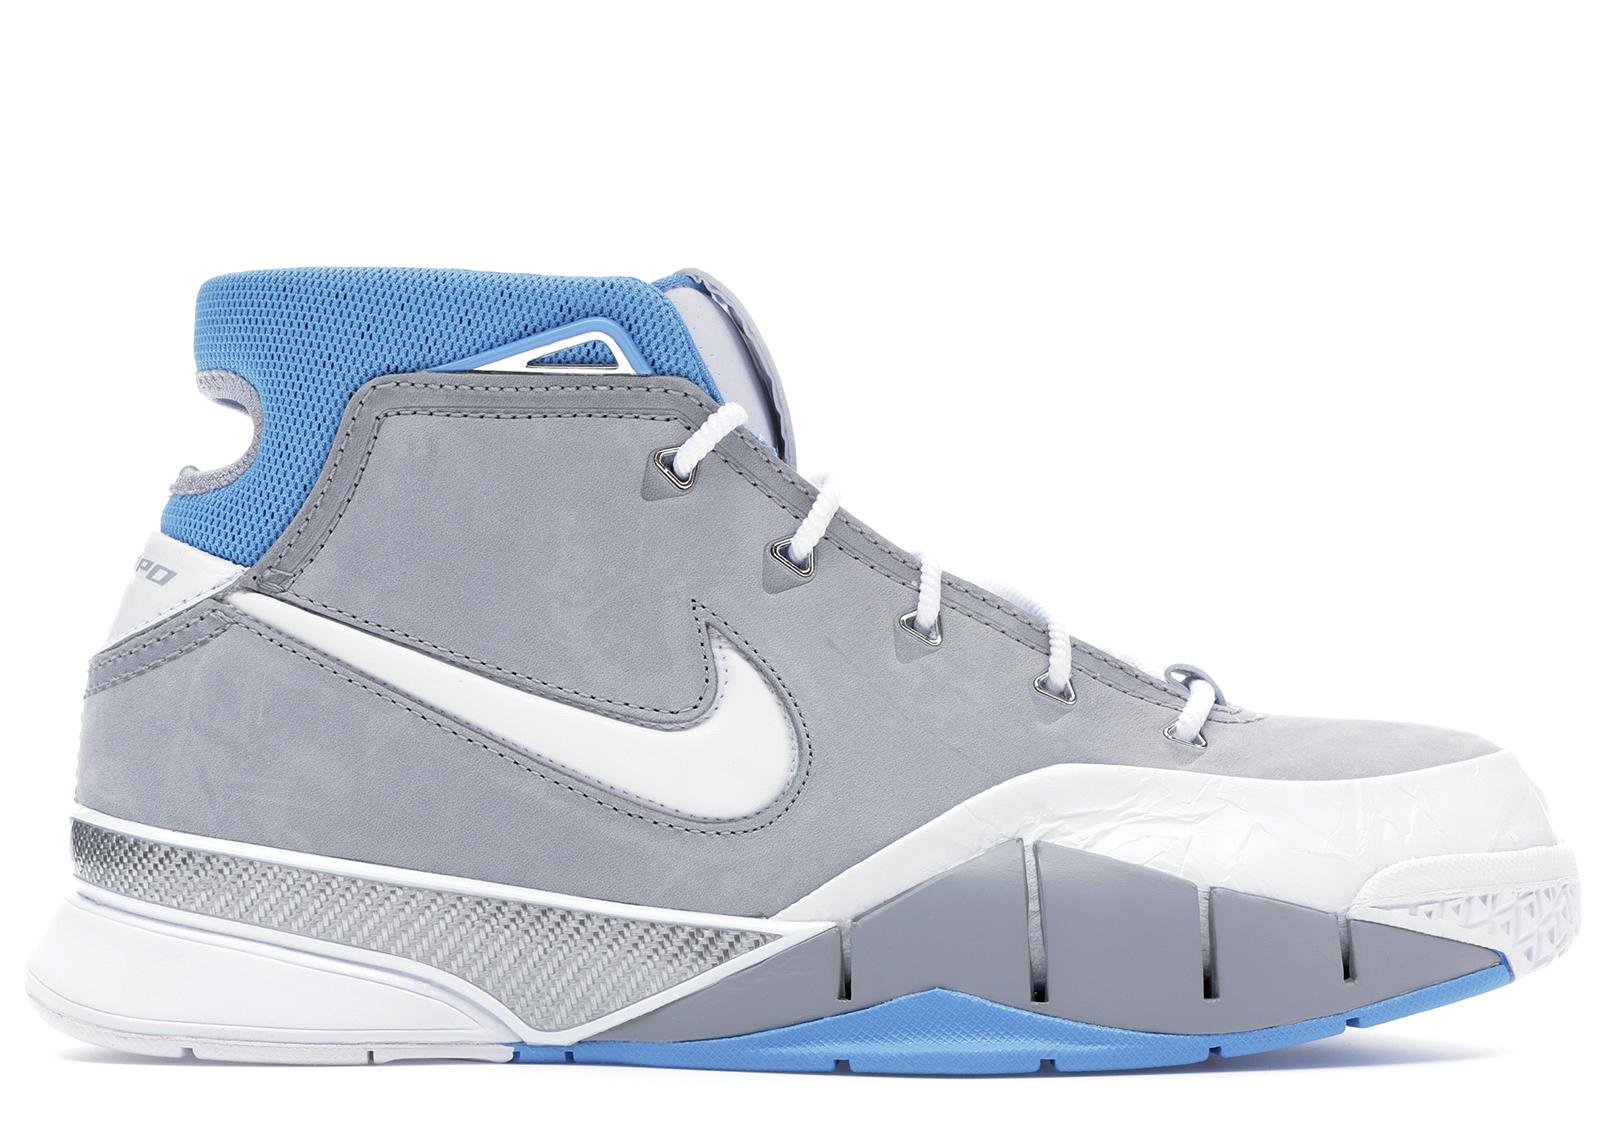 Nike Kobe 1 Protro MPLS - AQ2728-001